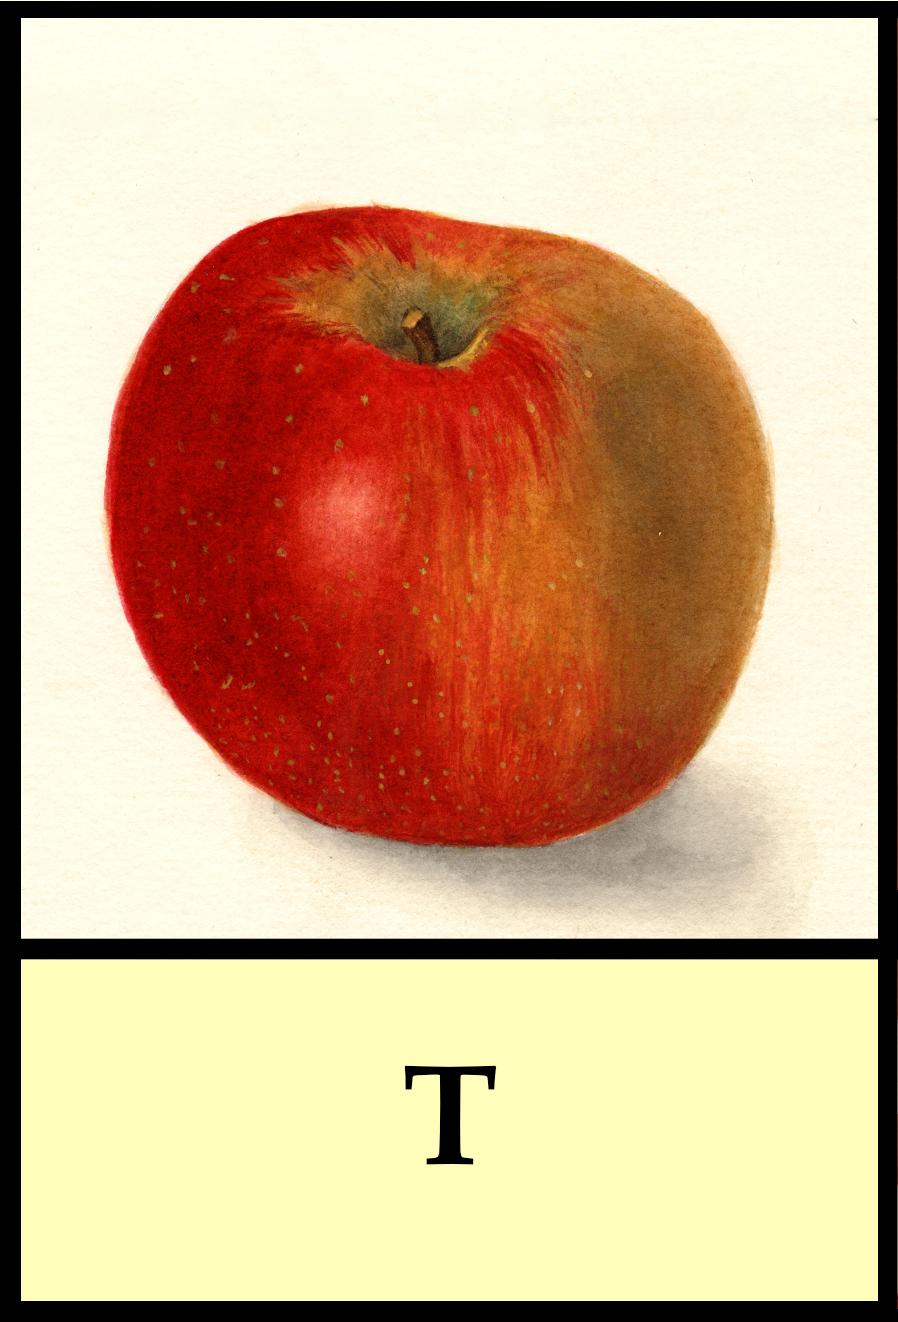 T apples